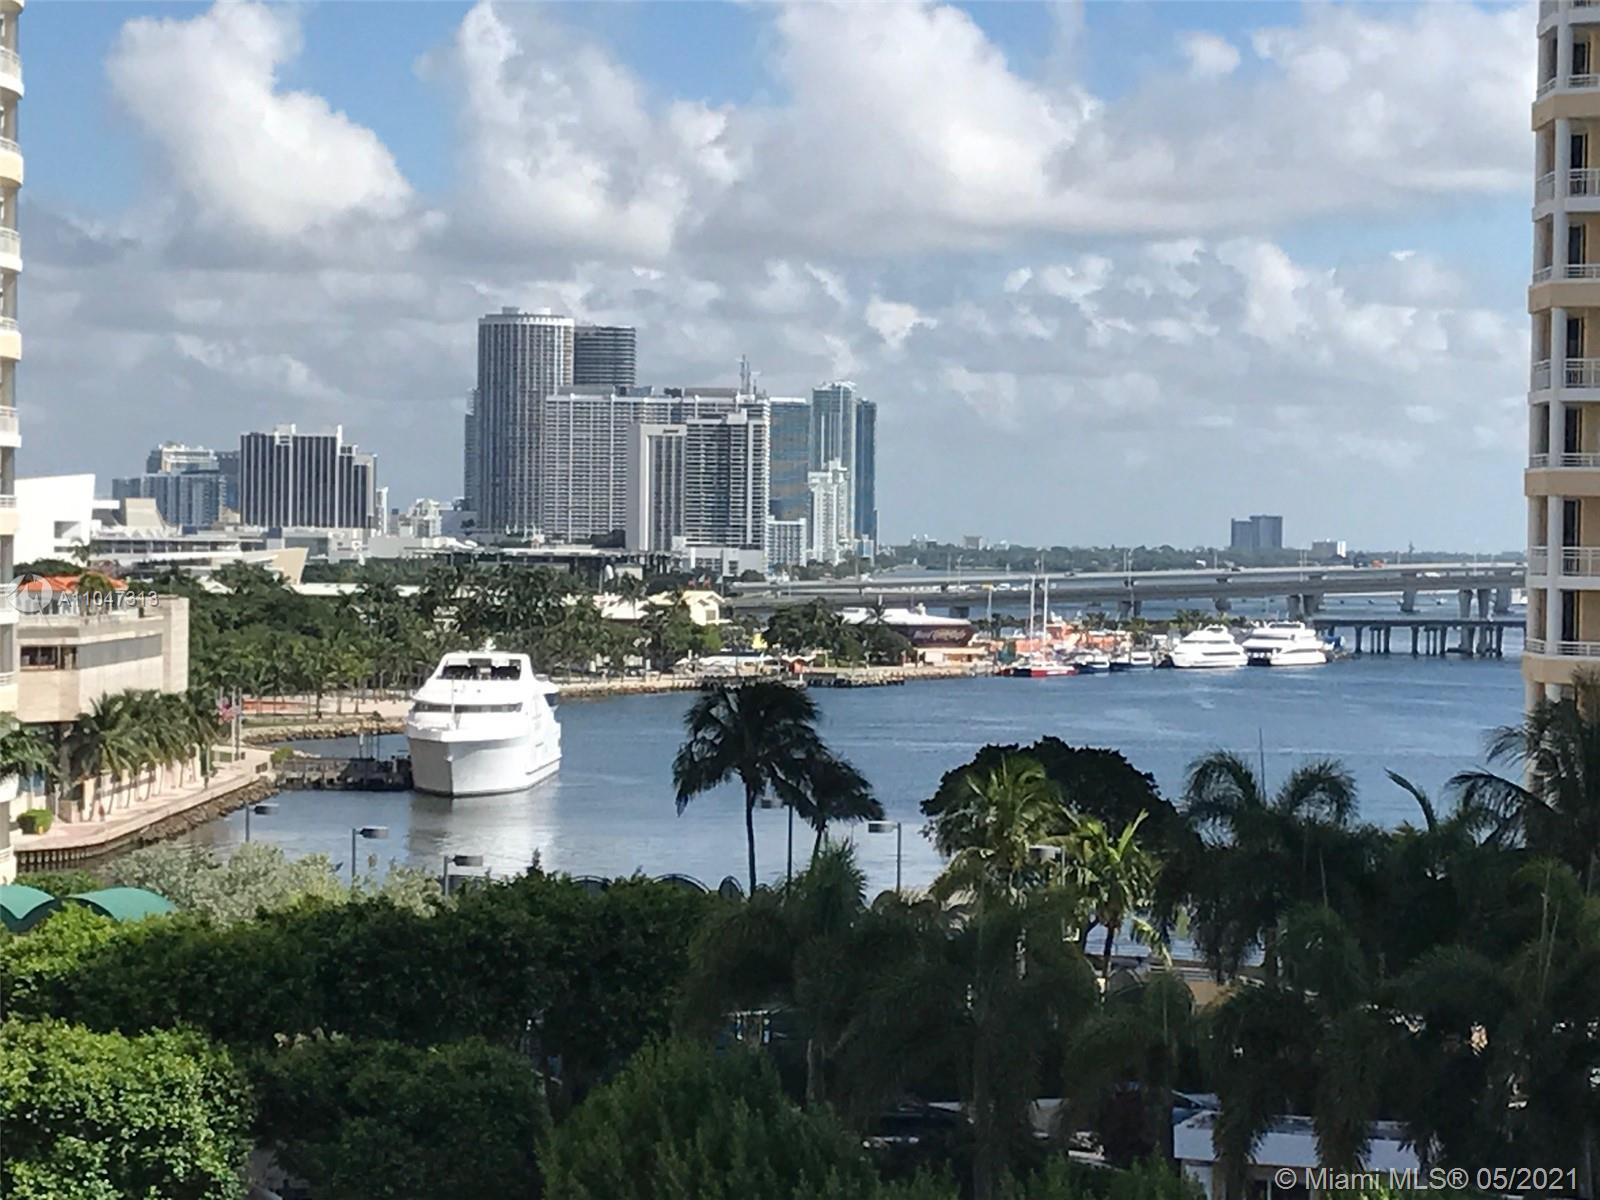 Brickell Key Two #1002 - 540 BRICKELL KEY DR #1002, Miami, FL 33131